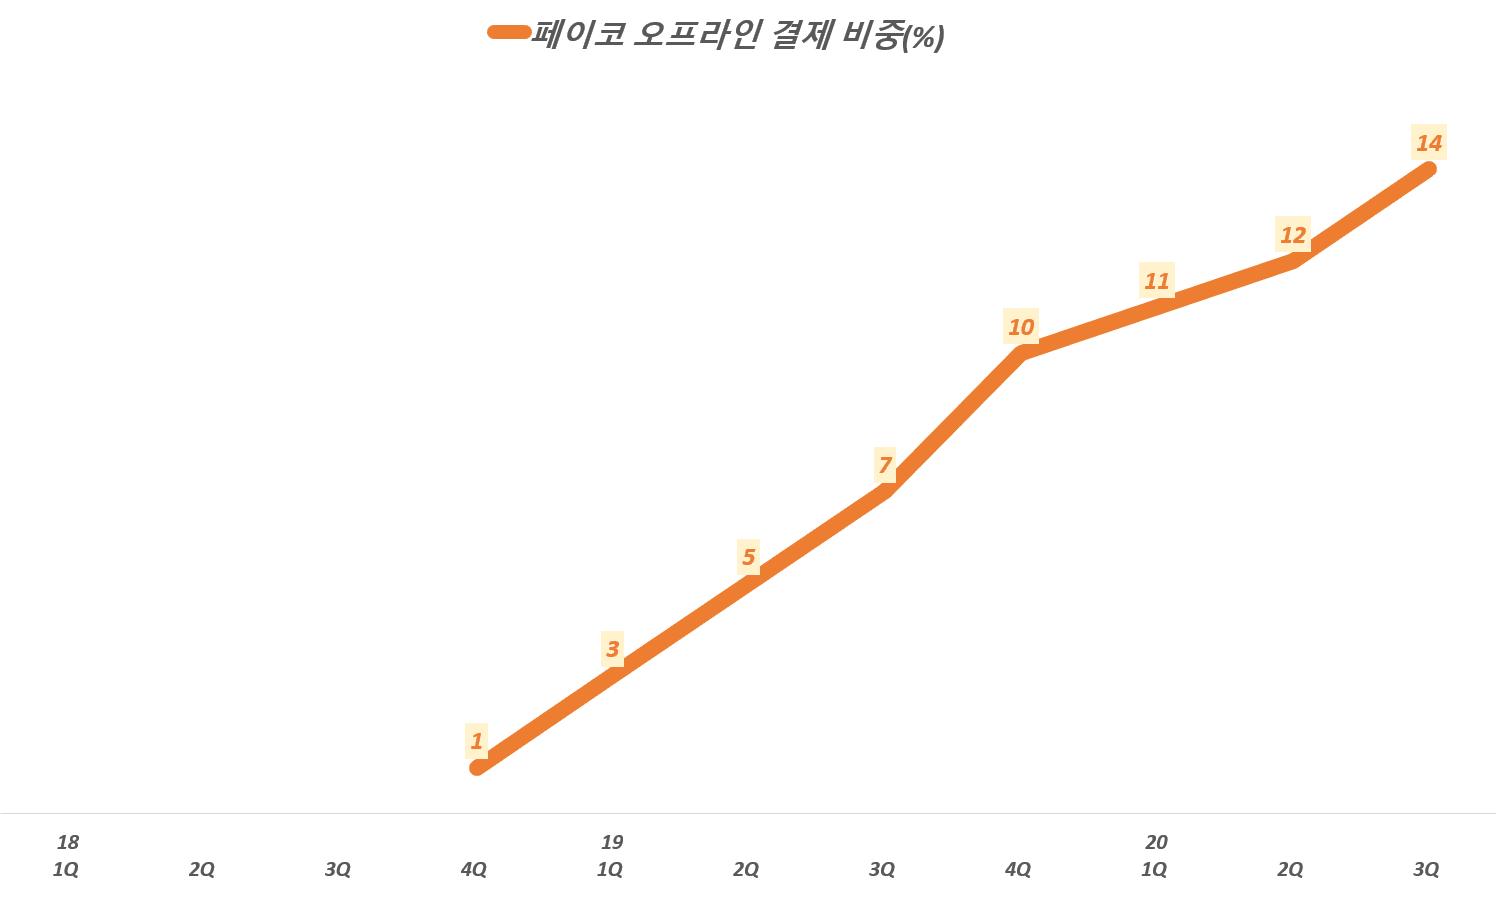 NHN 실적, 분기별 페이코 오프라인 겾제 비중 추이( ~ 20년 3분기, 대신증권 자료 및 페이코 발표 자료 참조, Graph by Happist